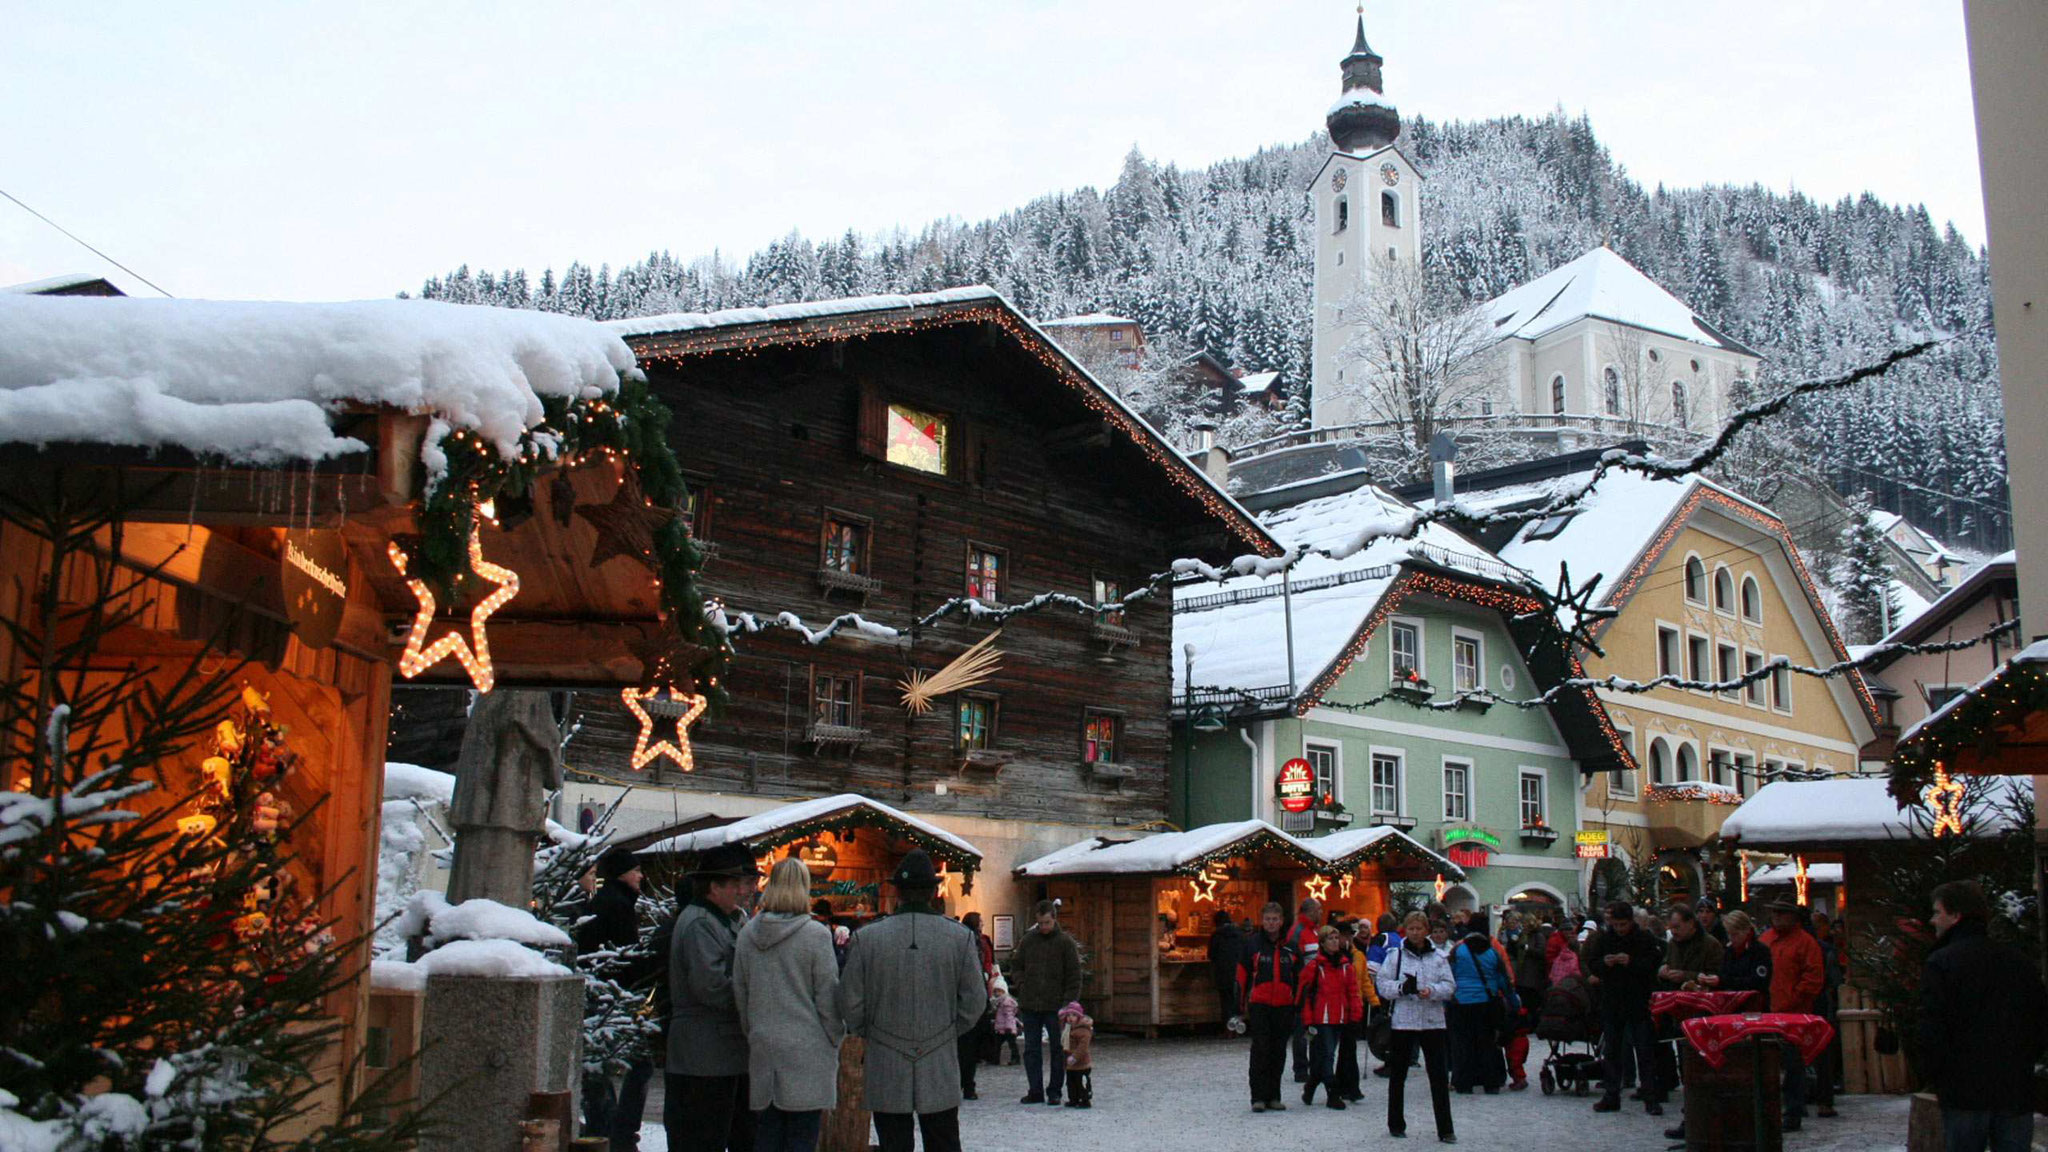 Salzburg Christmas Market.Salzburg Christmas Market Advent Market Salzburger Bergadvent